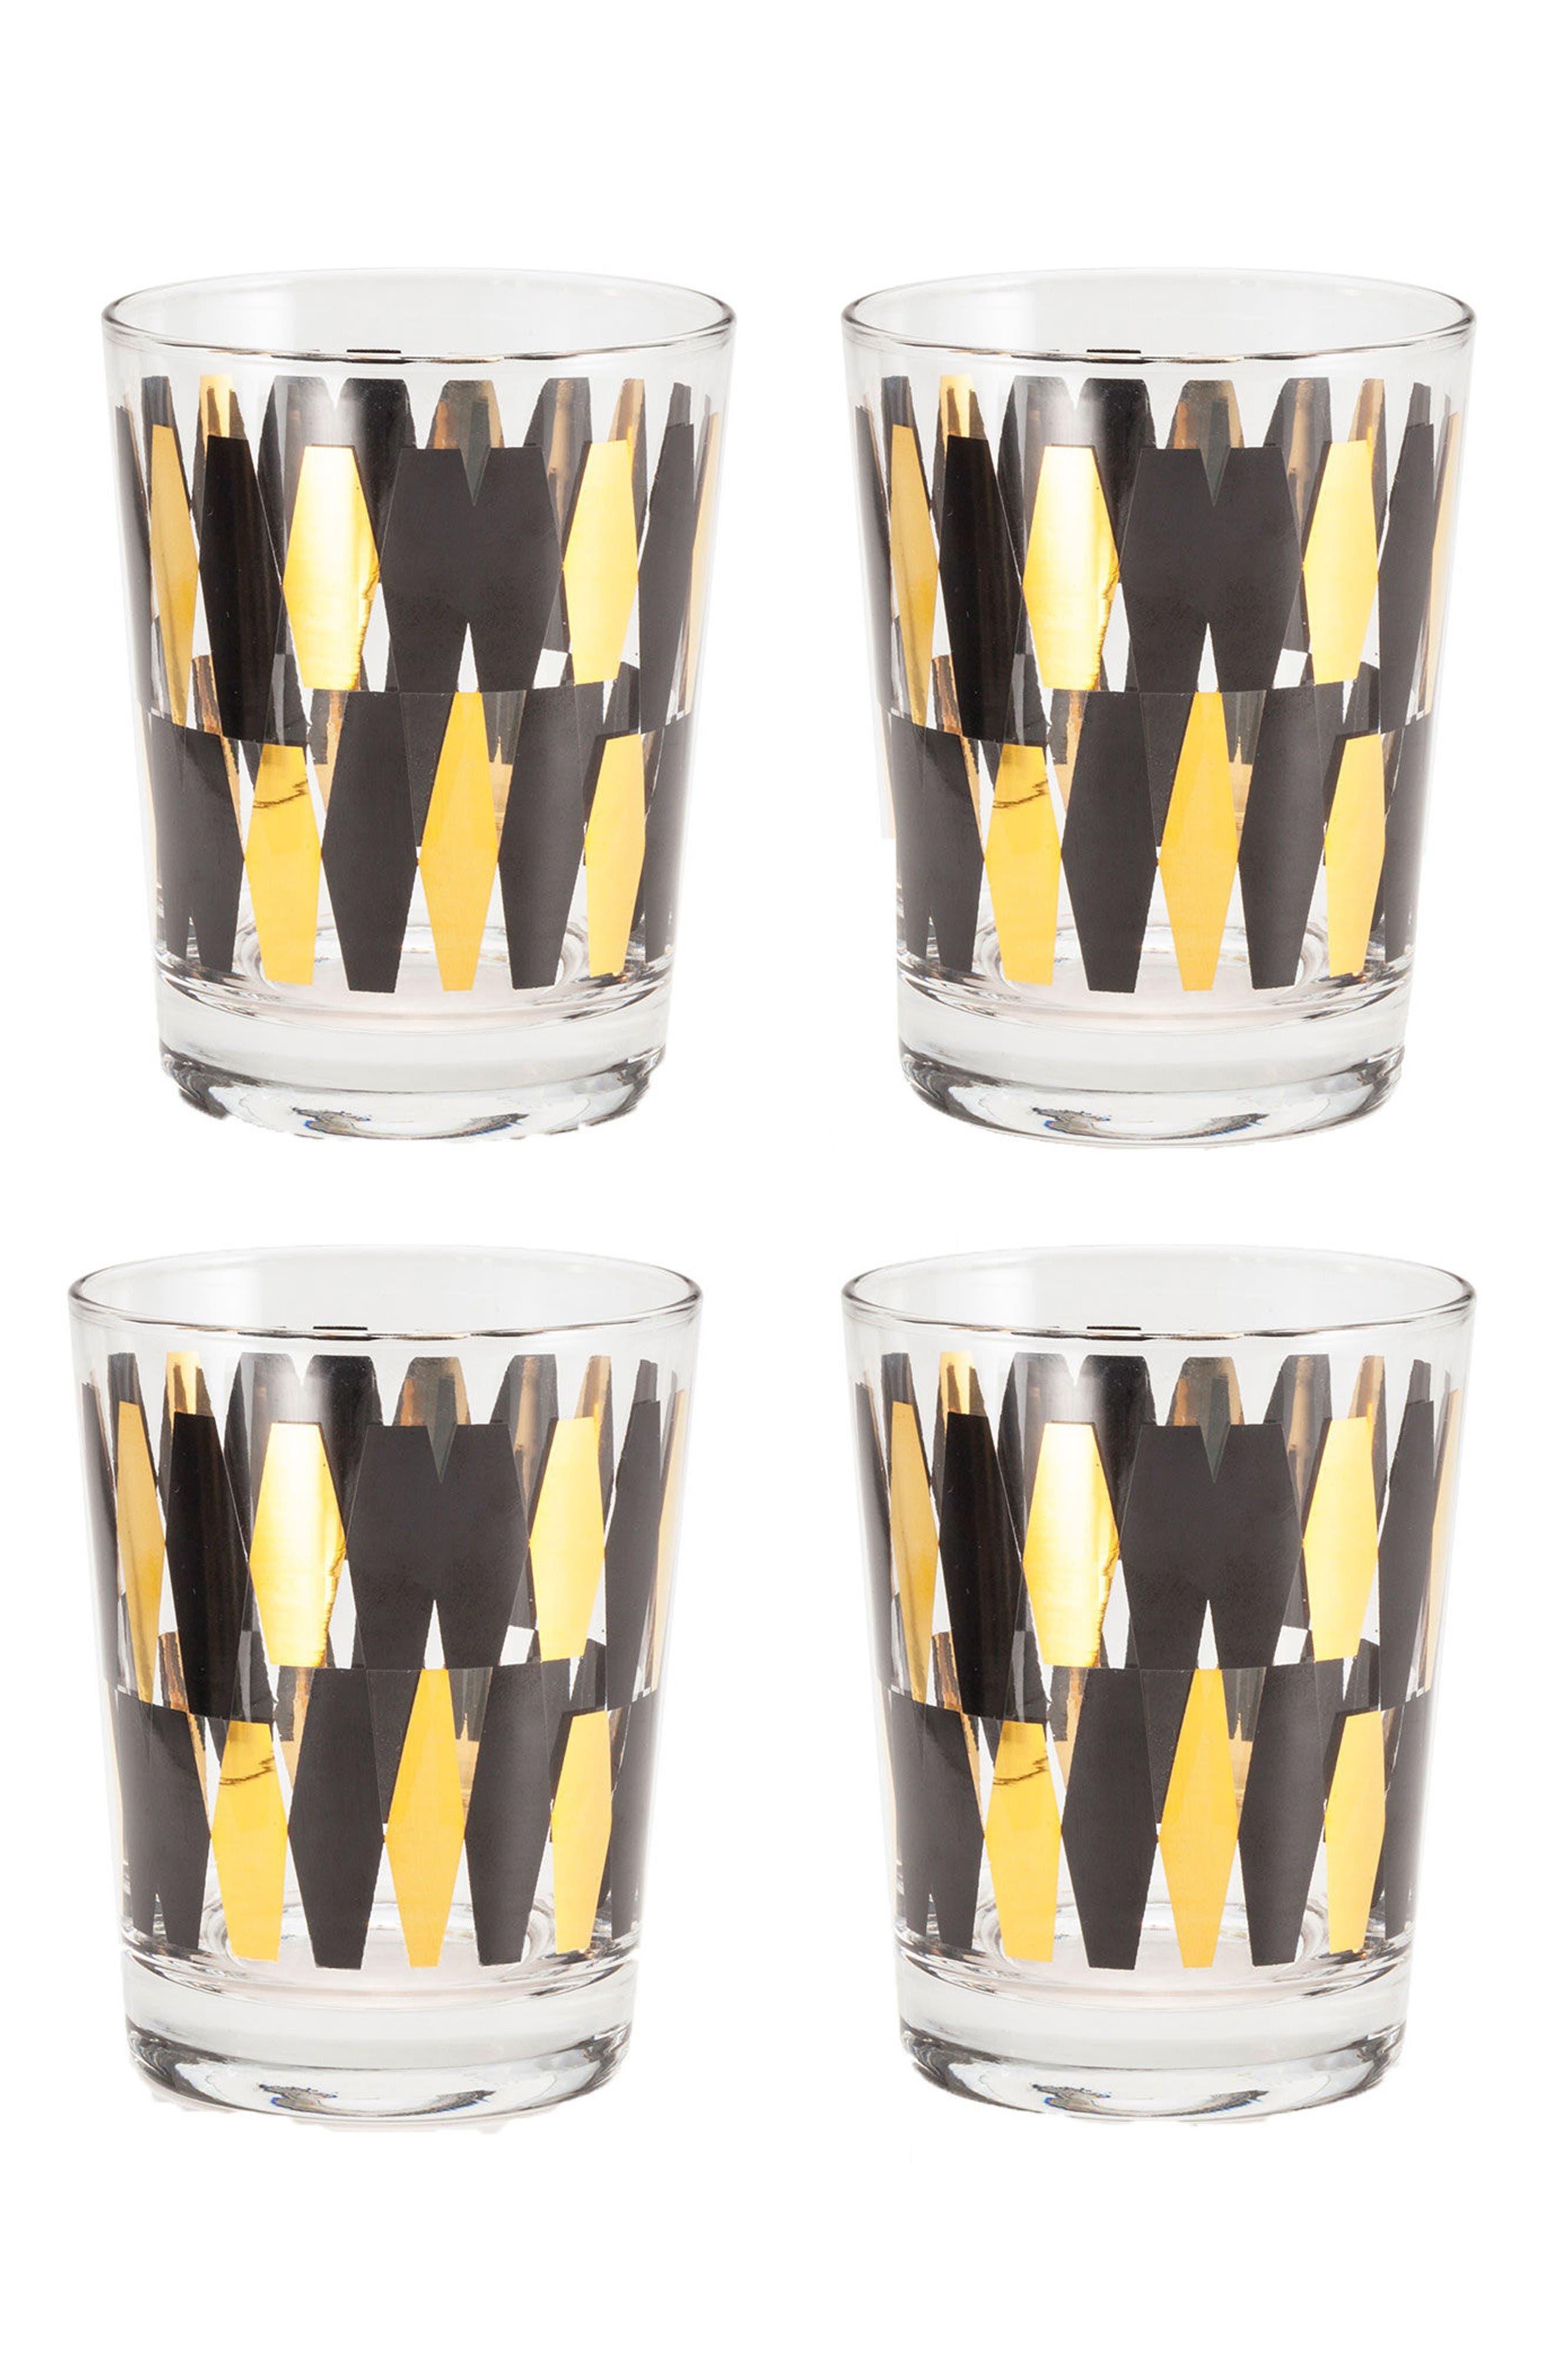 Rosanna Monte Carlo Set of 4 Double Old Fashioned Glasses